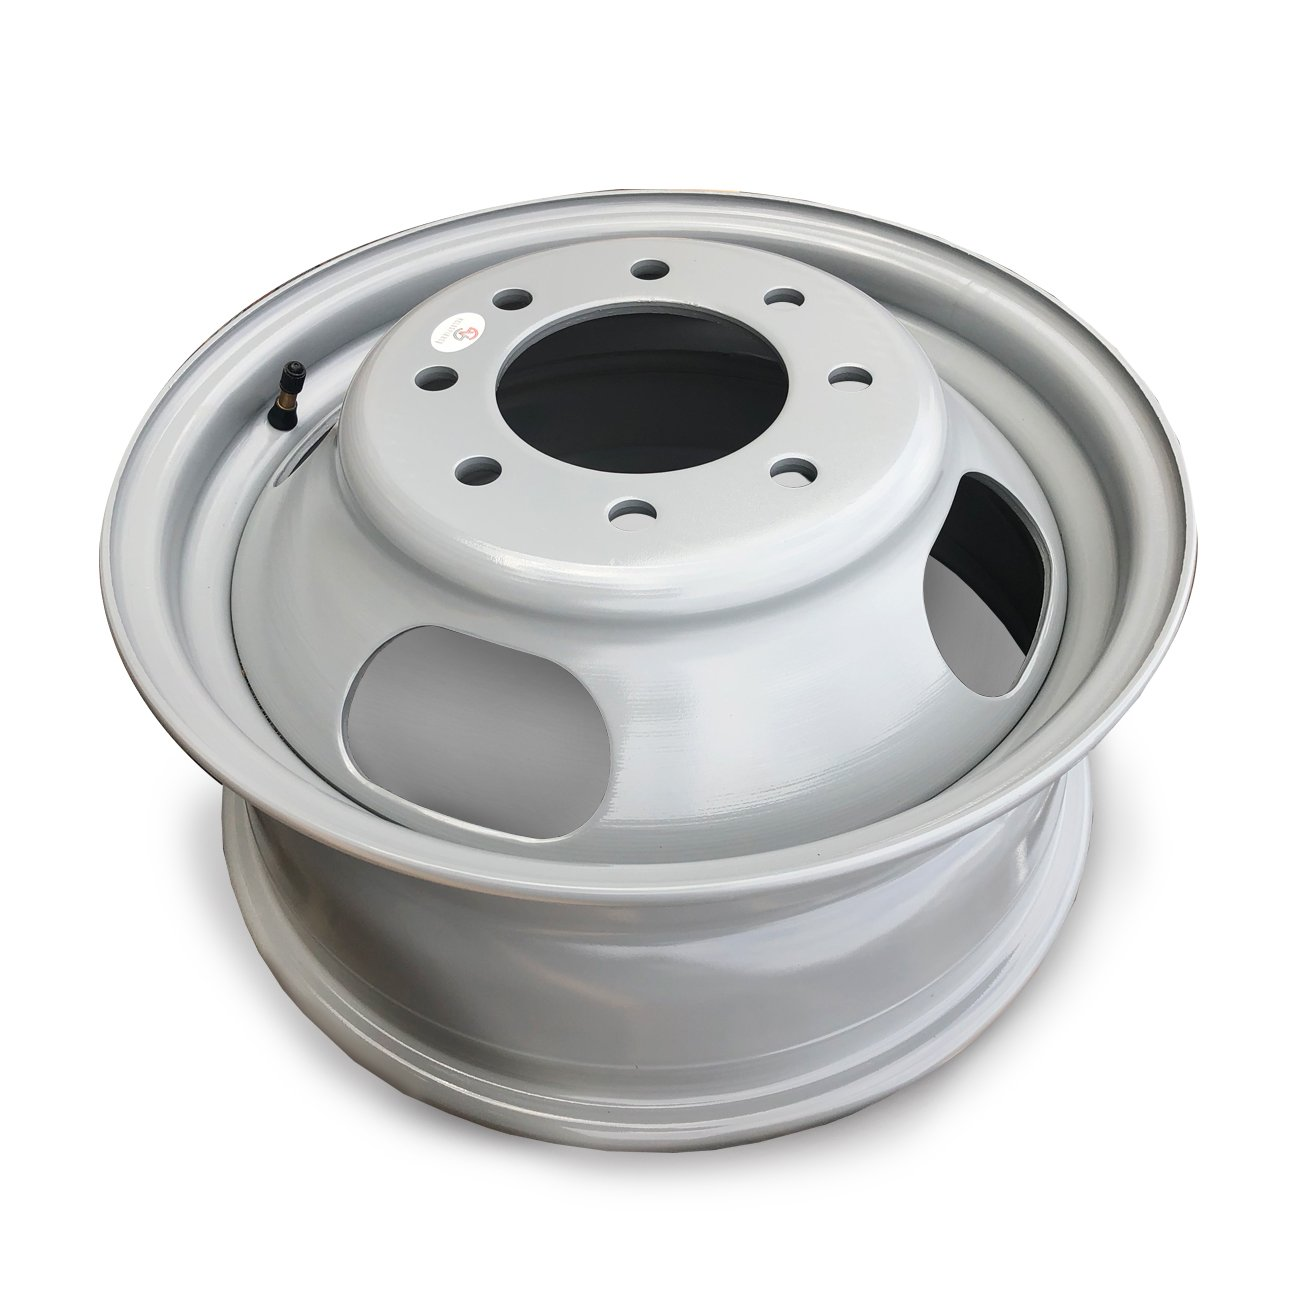 16X6.5 GMC 01-07 Sierra 3500 Super Duty Dually Steel Wheel Rim OEM Quality 5125